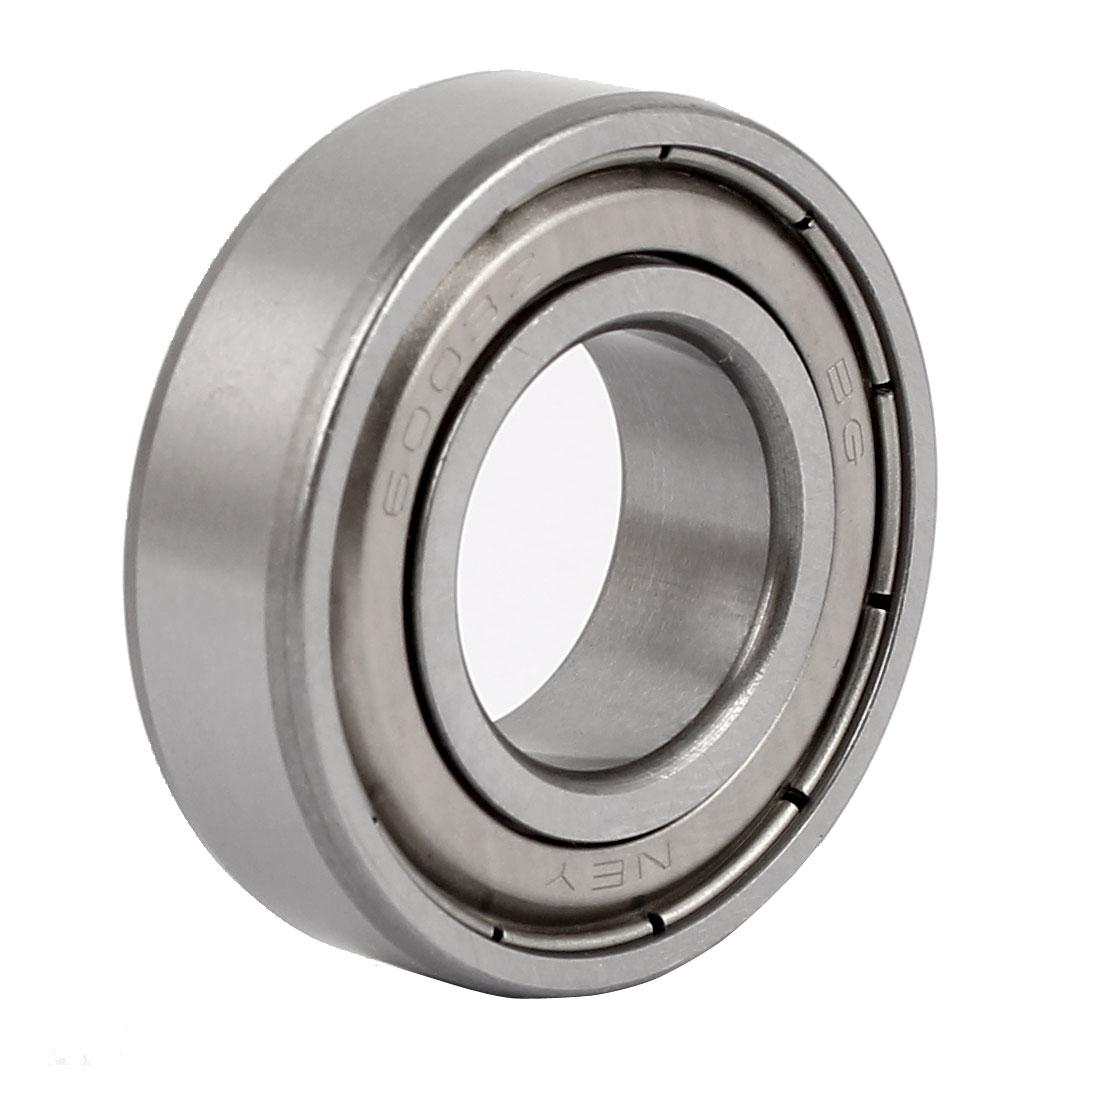 ZZ6003 Double Shielded Deep Groove Ball Bearing 35mmx17mmx10mm